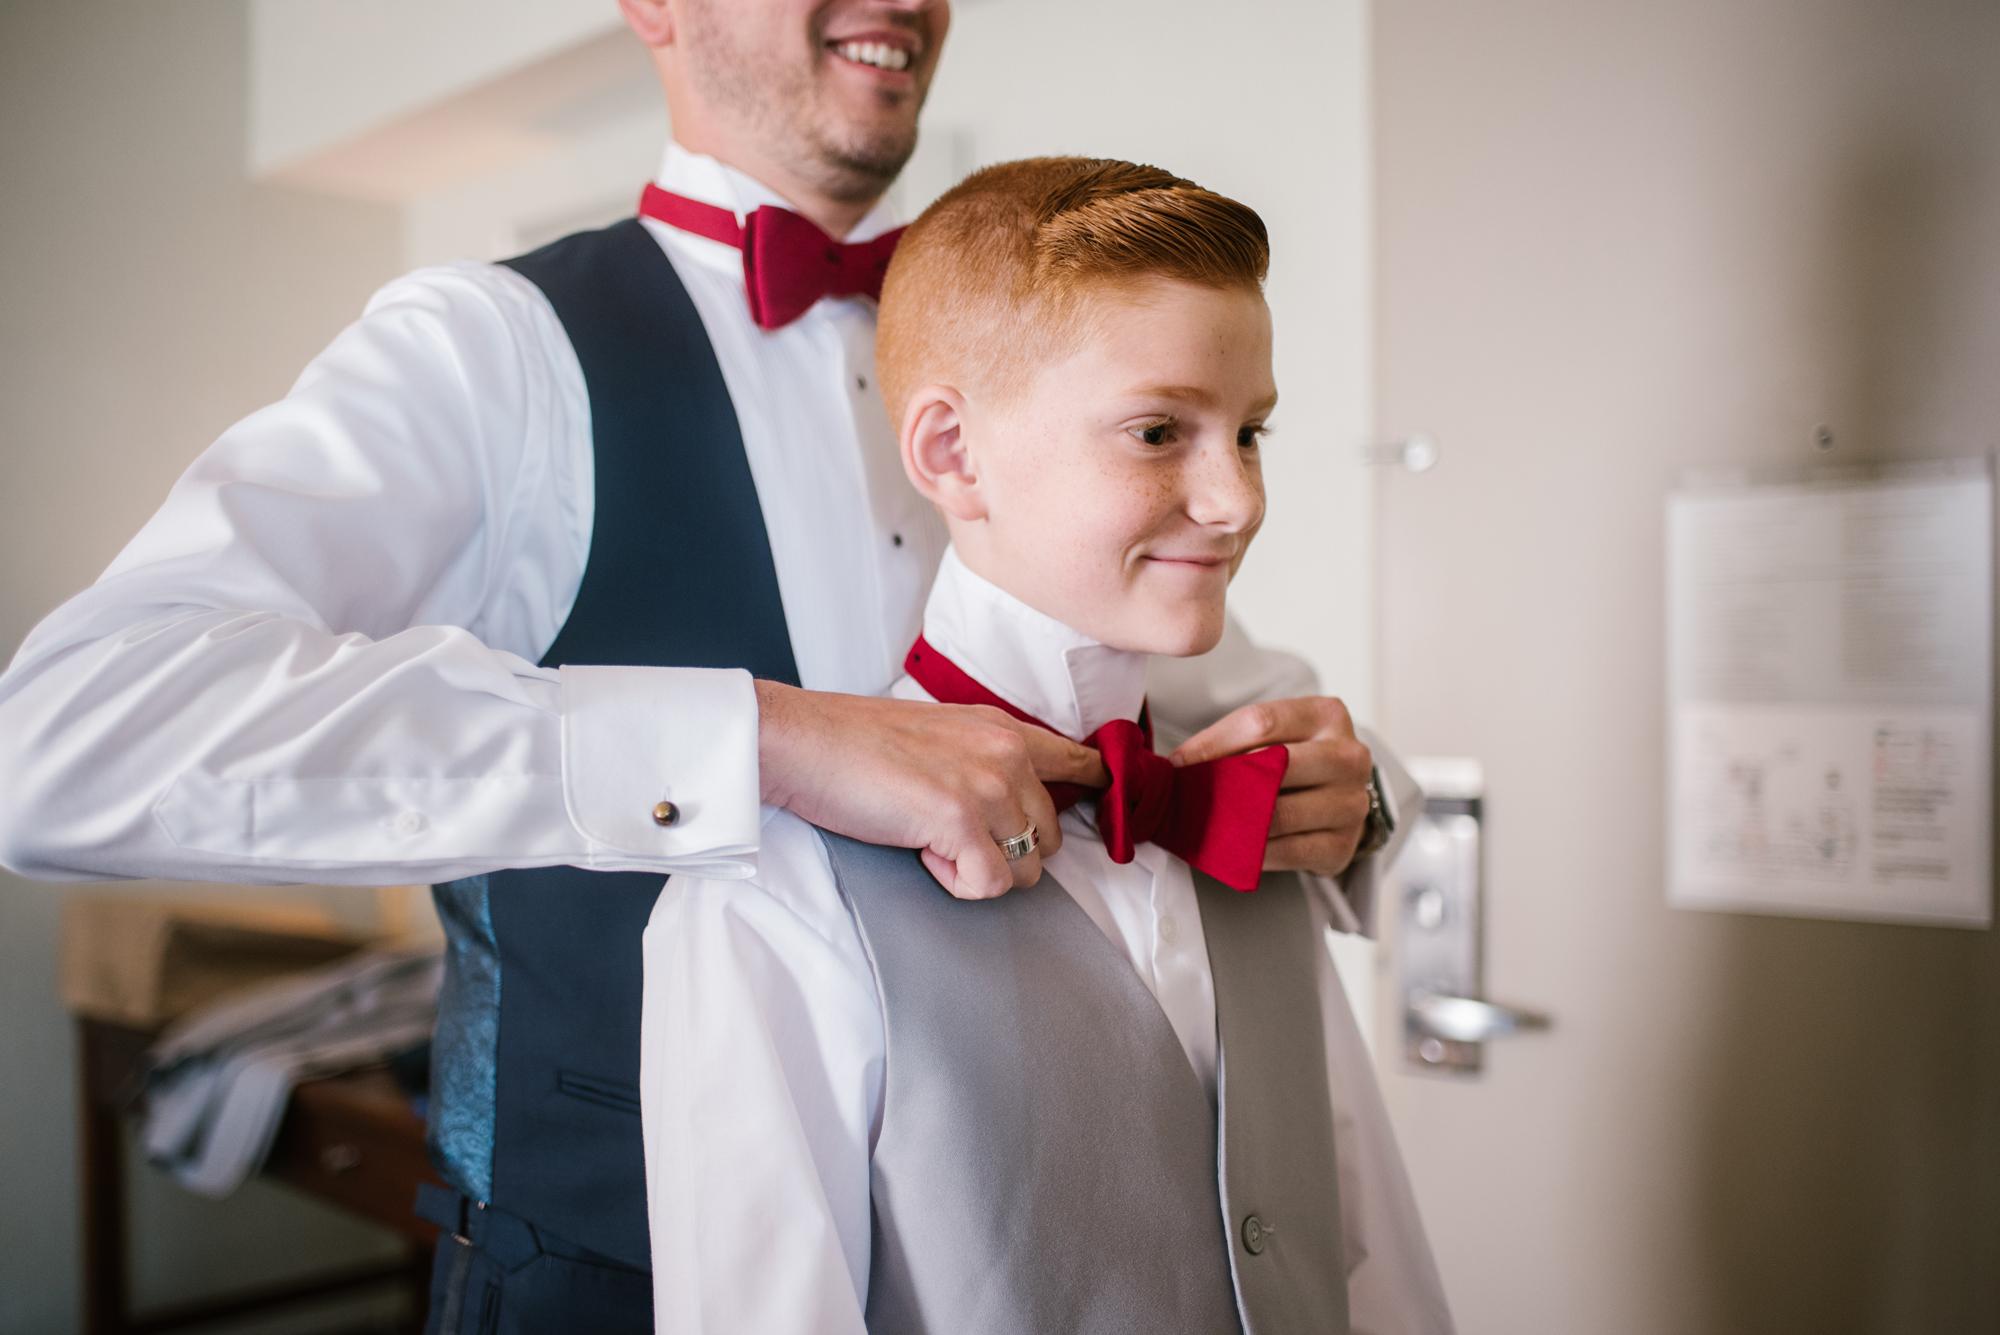 detroit-michigan-westin-book-cadillac-groomsmen-getting-ready-sydney-marie-photography (5).jpg